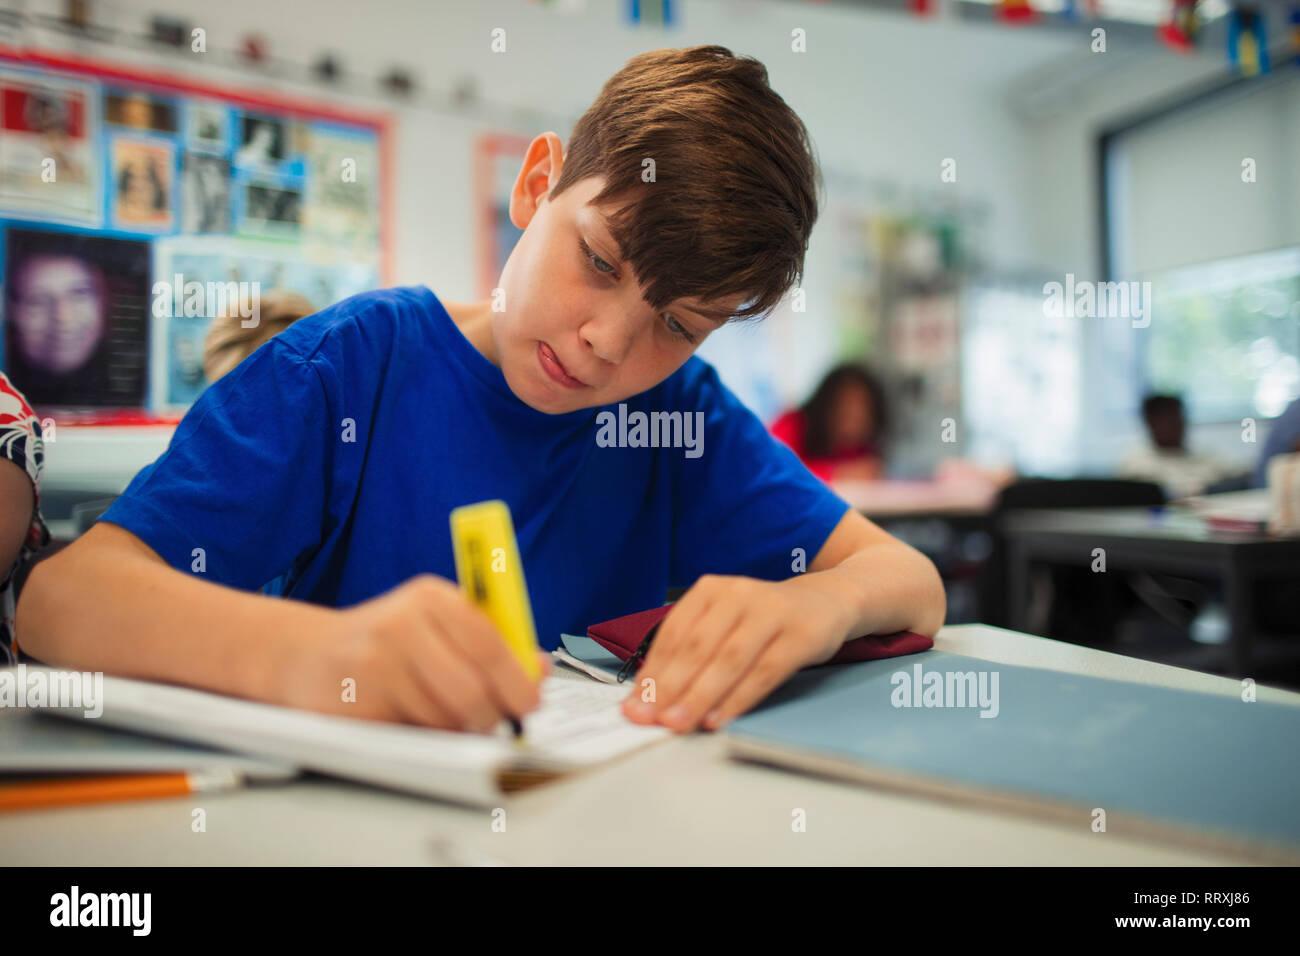 Focused junior high school boy student using highlighter, doing homework in classroom Stock Photo